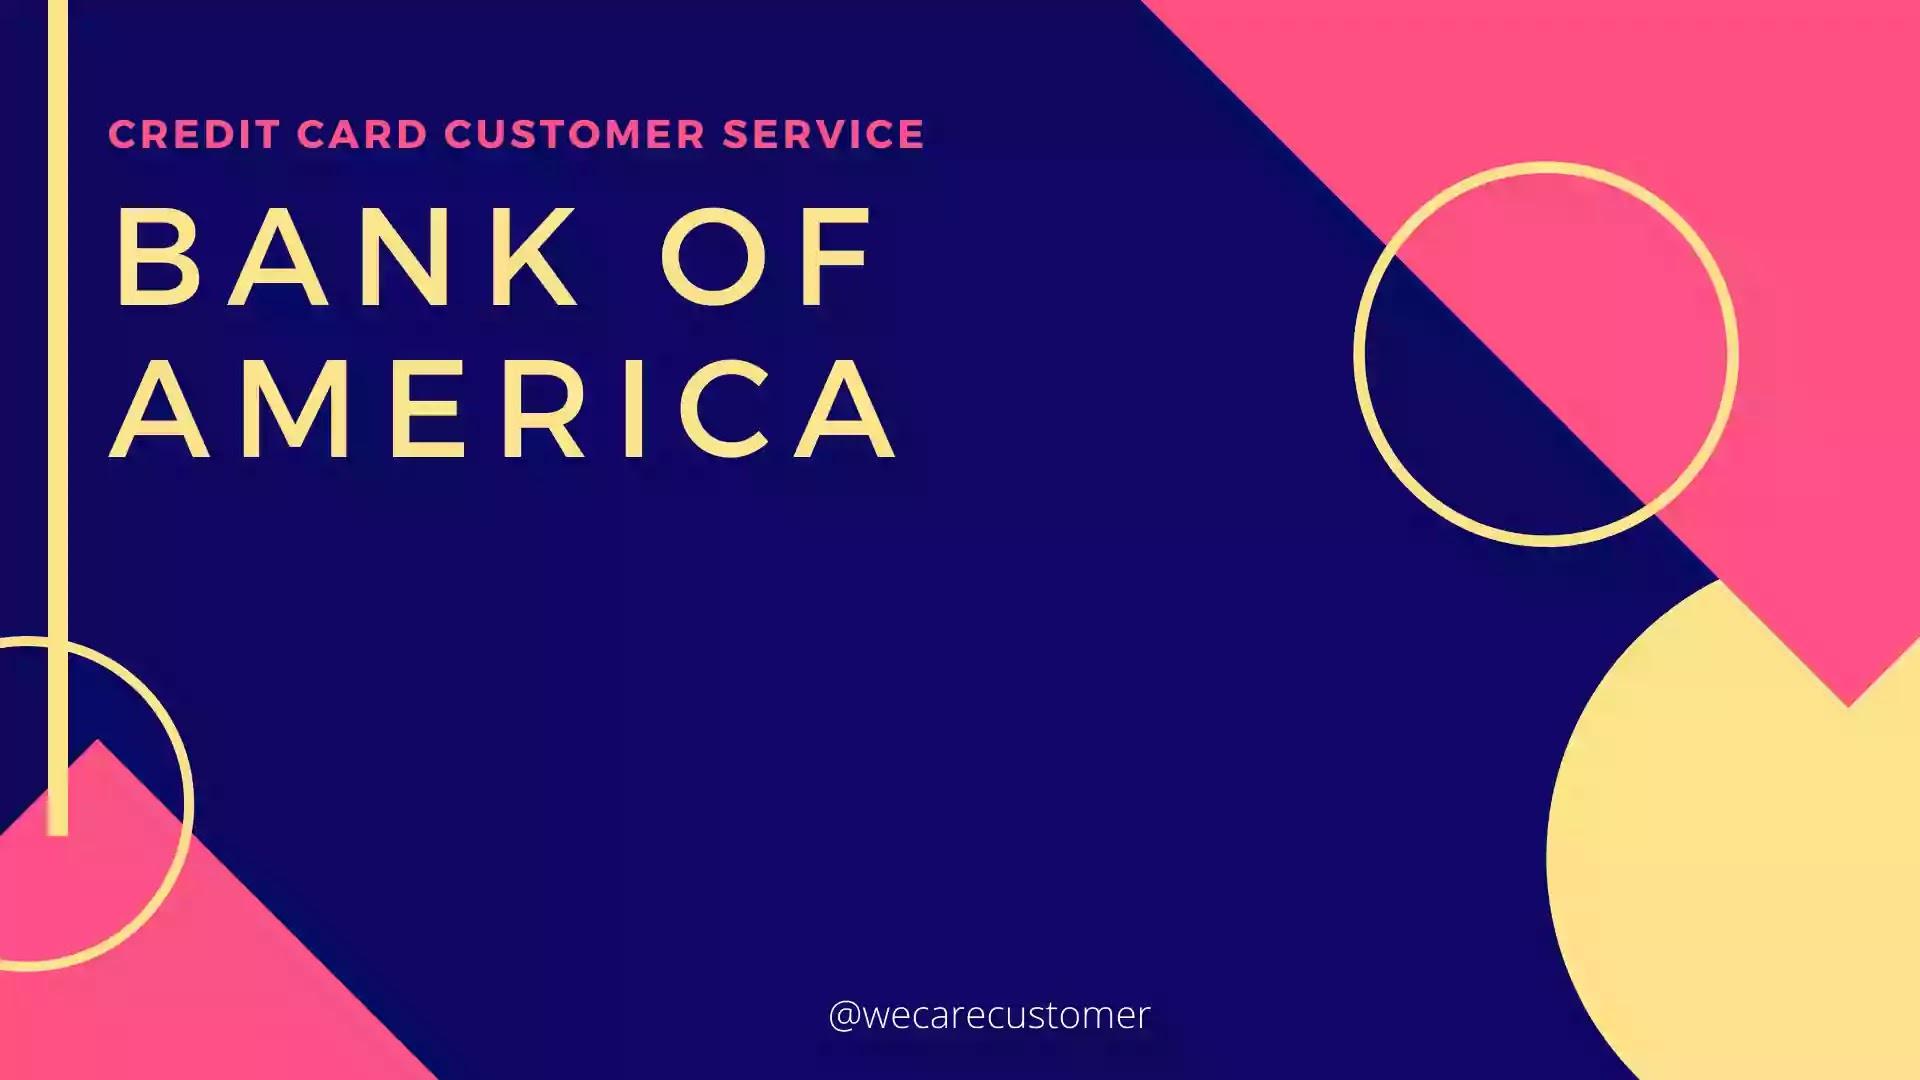 Bank of America credit card customer service contact ...